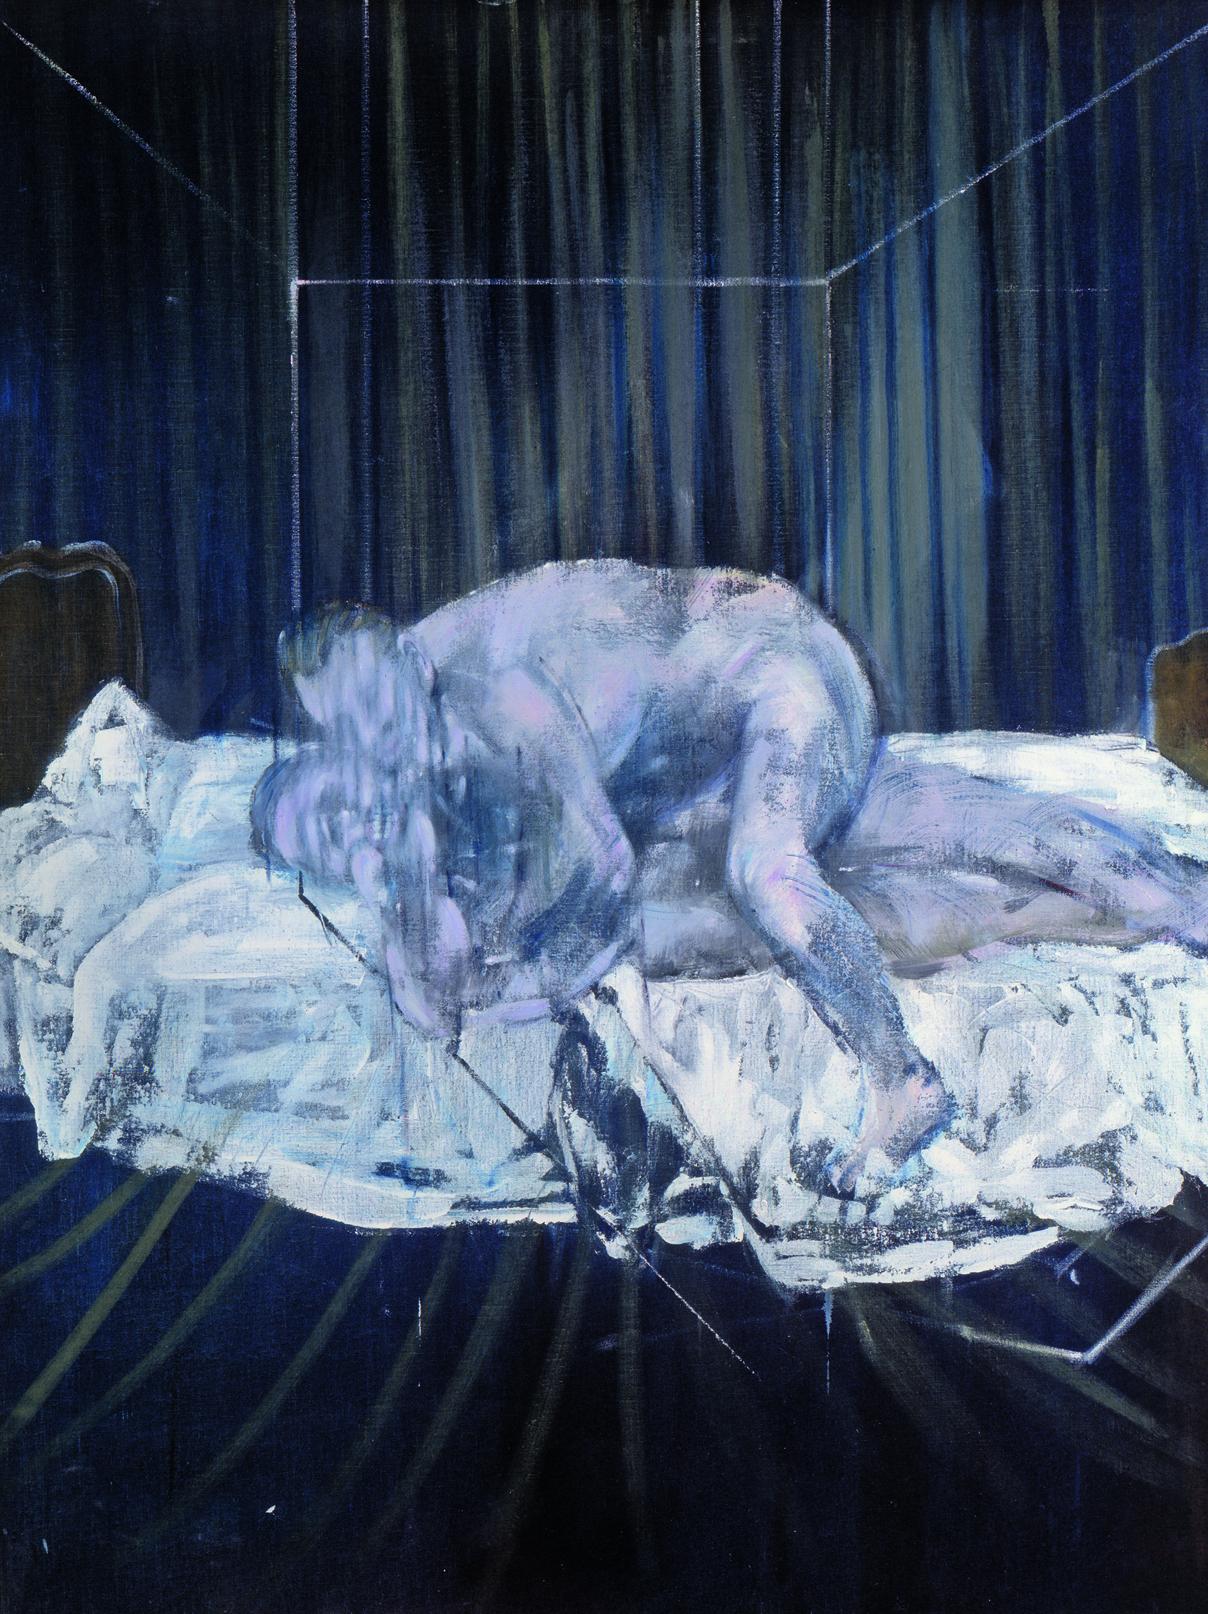 Francis Bacon, «Two Figures», 1953. Η αλληλεπίδραση μεταξύ σεξ και βίας προκαλεί μία παθιασμένη ατμόσφαιρα ανάμεσα στις δύο αρσενικές φιγούρες στο έργο του Φράνσις Μπέικον, το οποίο δημιούργησε όταν η ομοφυλοφιλία ήταν ακόμα πλήρως ποινικοποιημένη